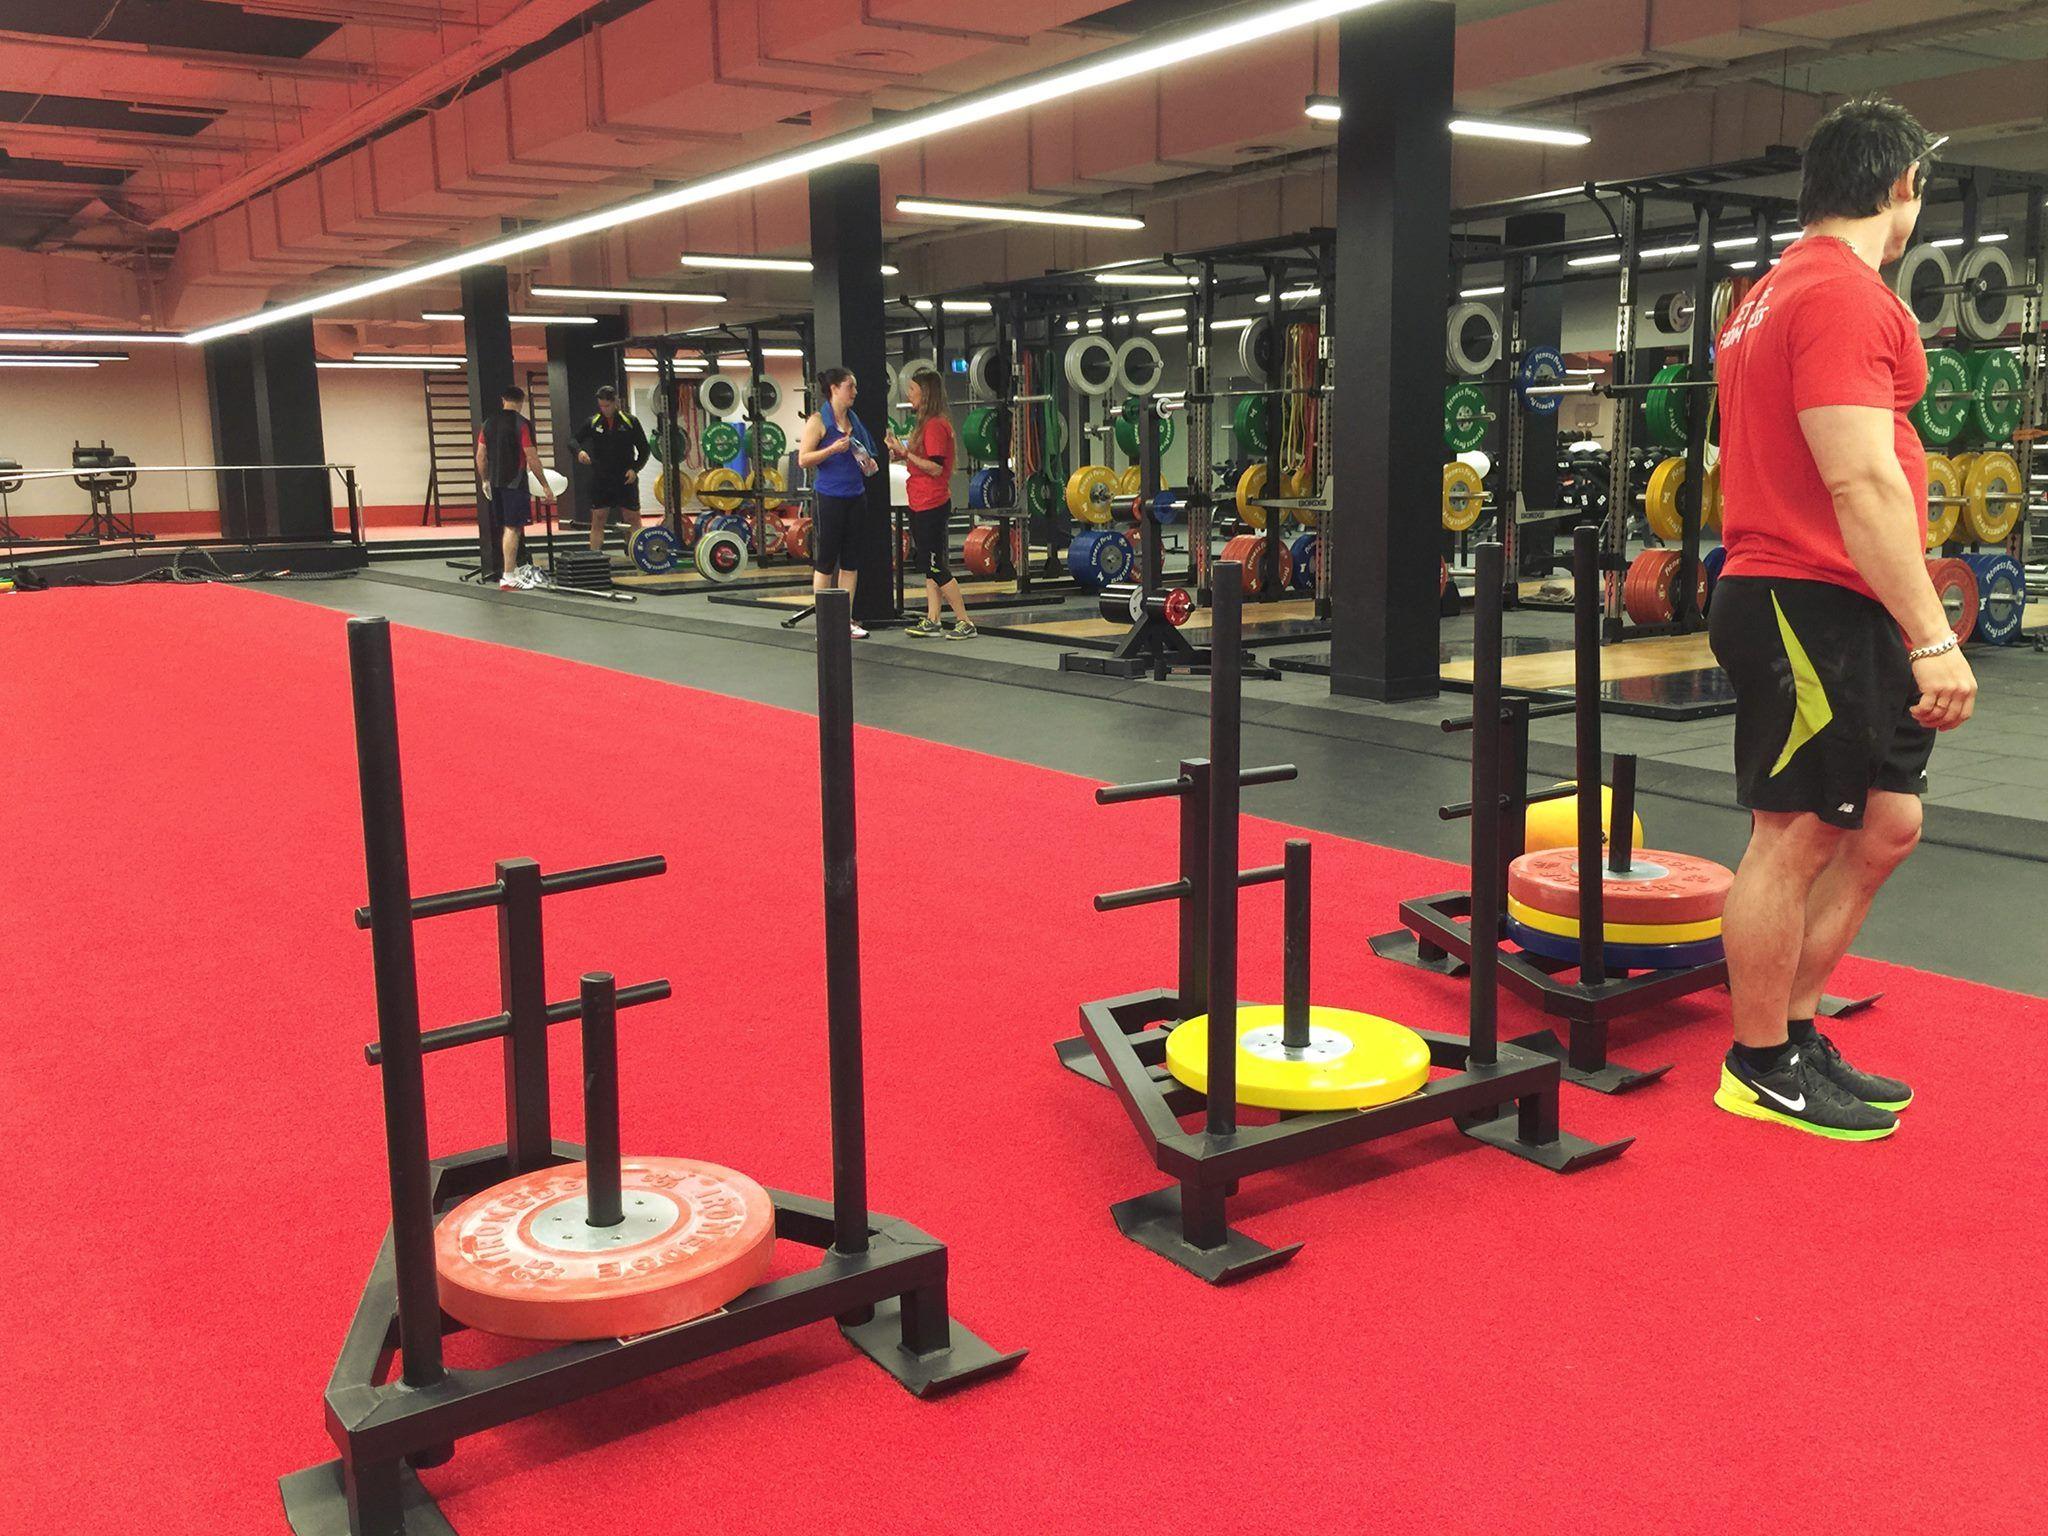 Neoflex 700 Series Fitness Flooring Fitness First Bond St Platinum Australia Floor Workouts Gym Flooring Gym Flooring Rubber